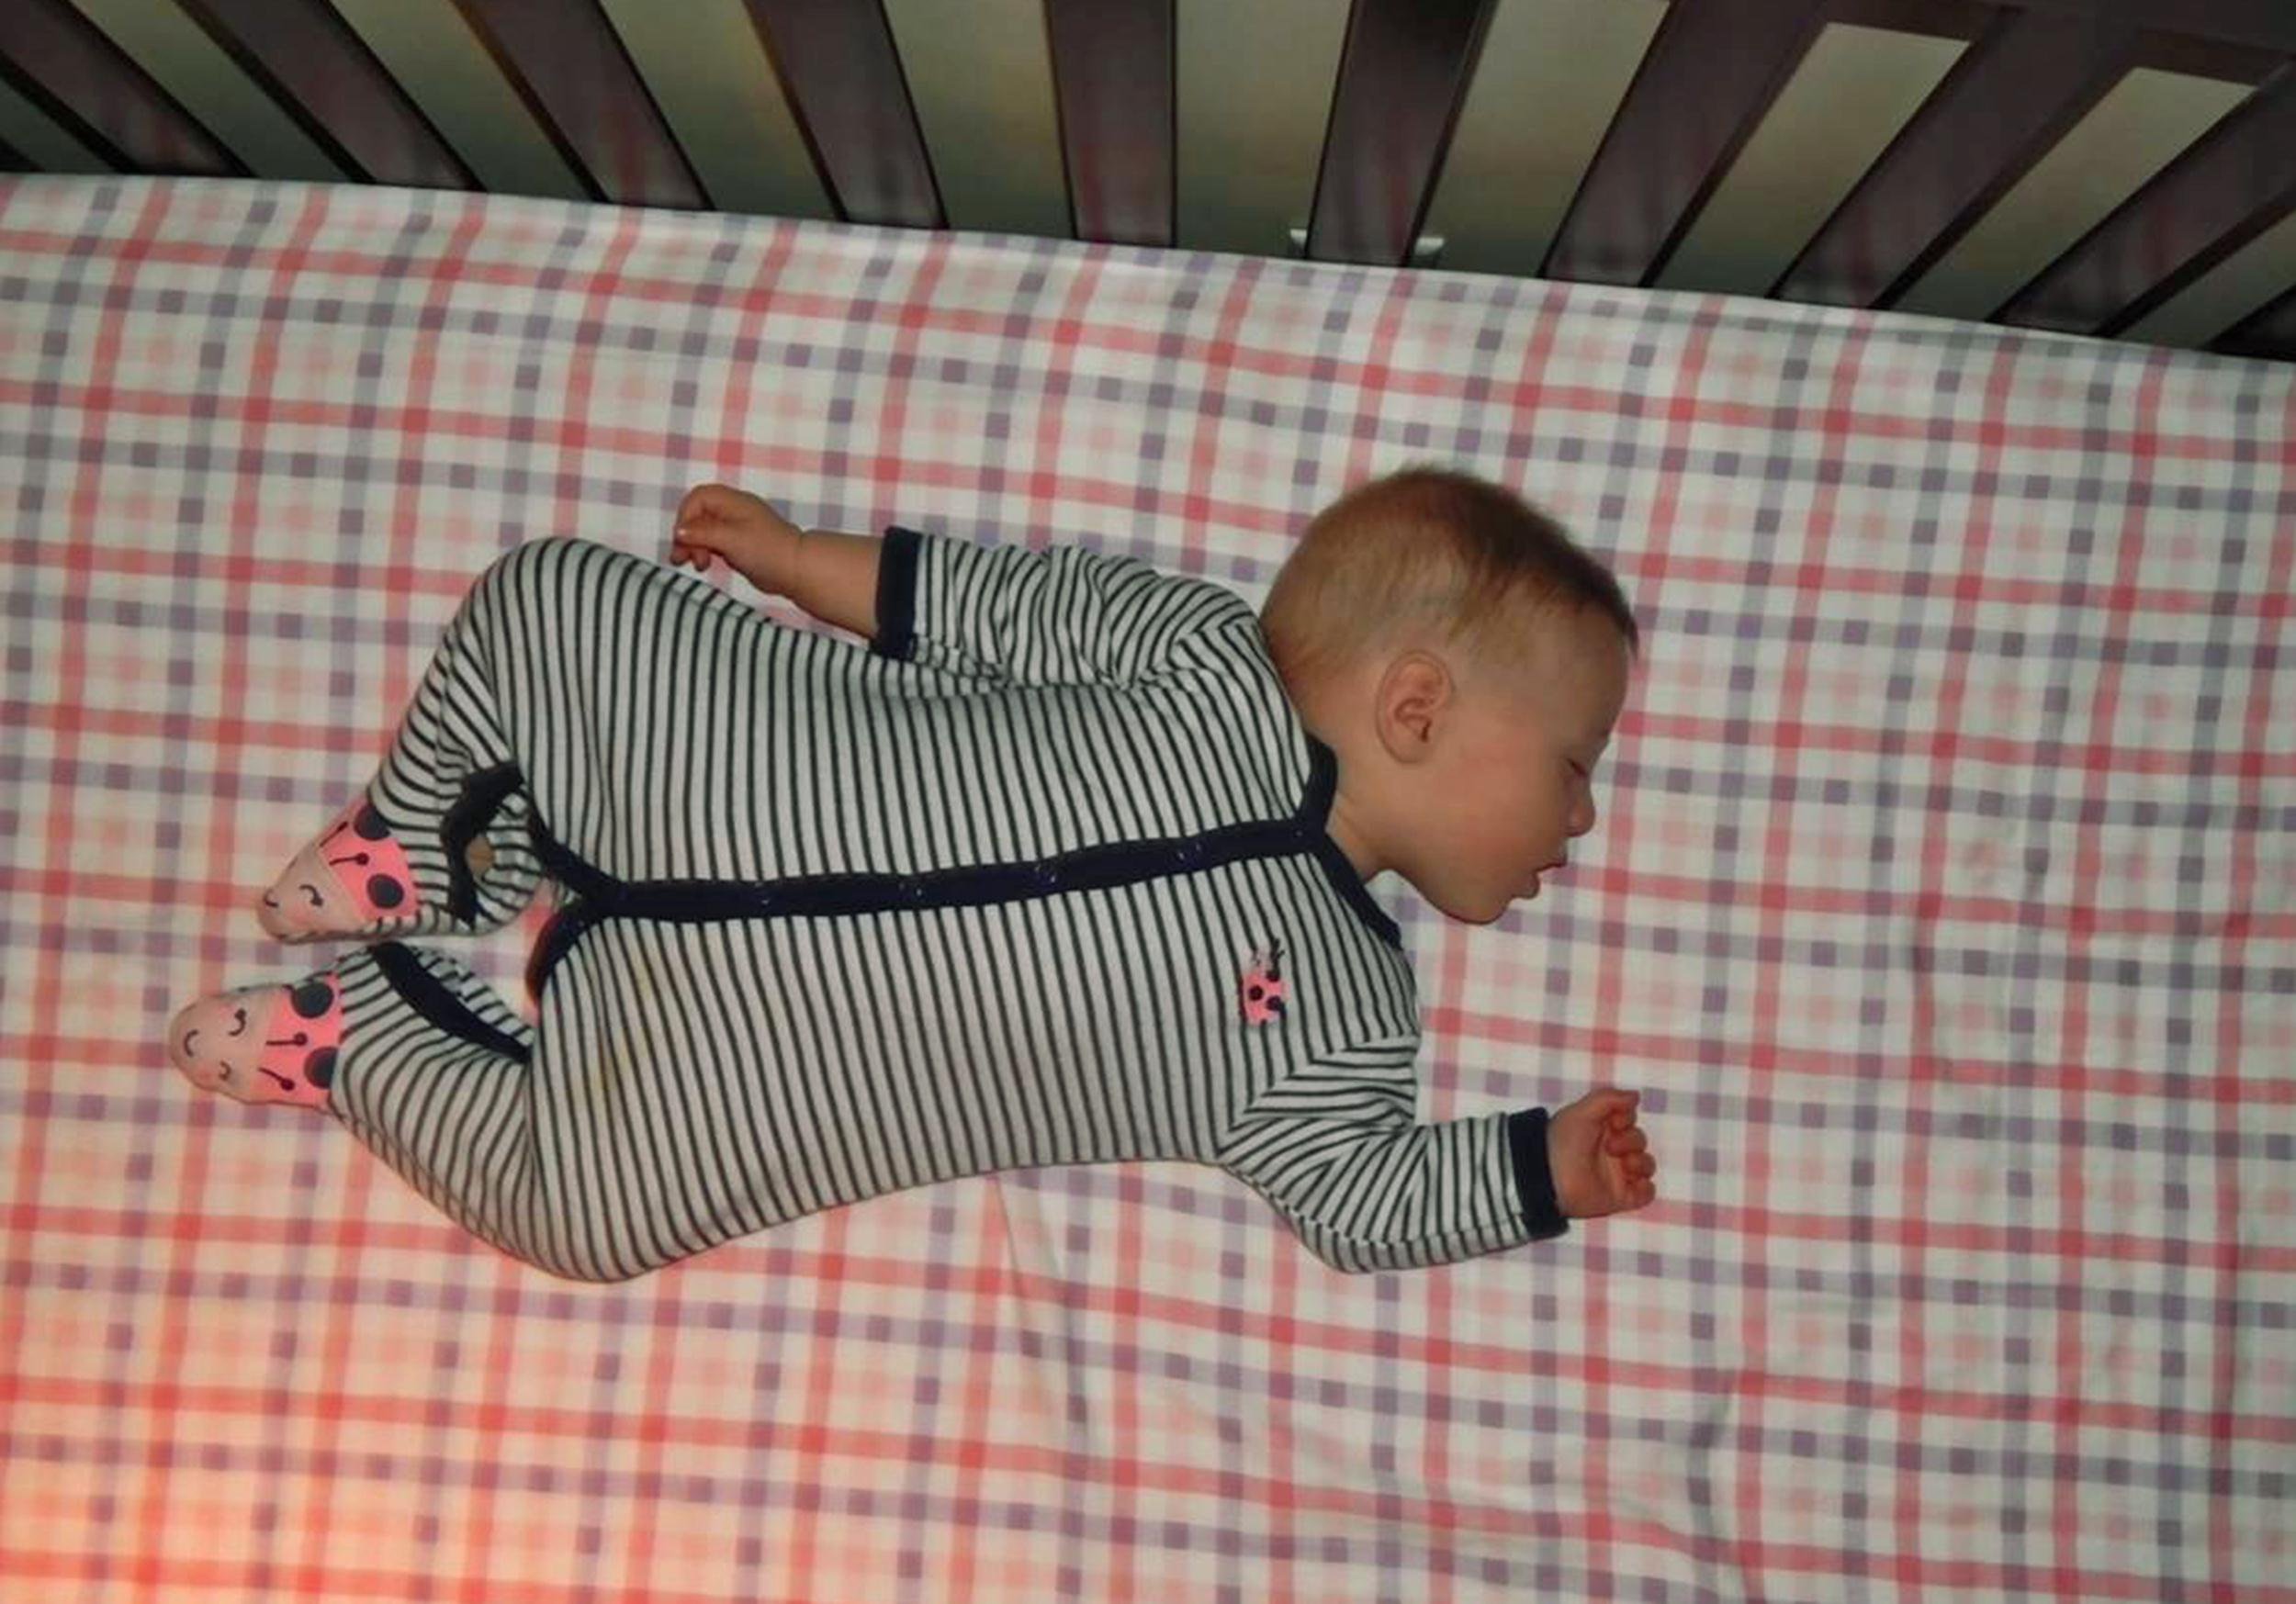 8-month-old twin Sophia Massoud